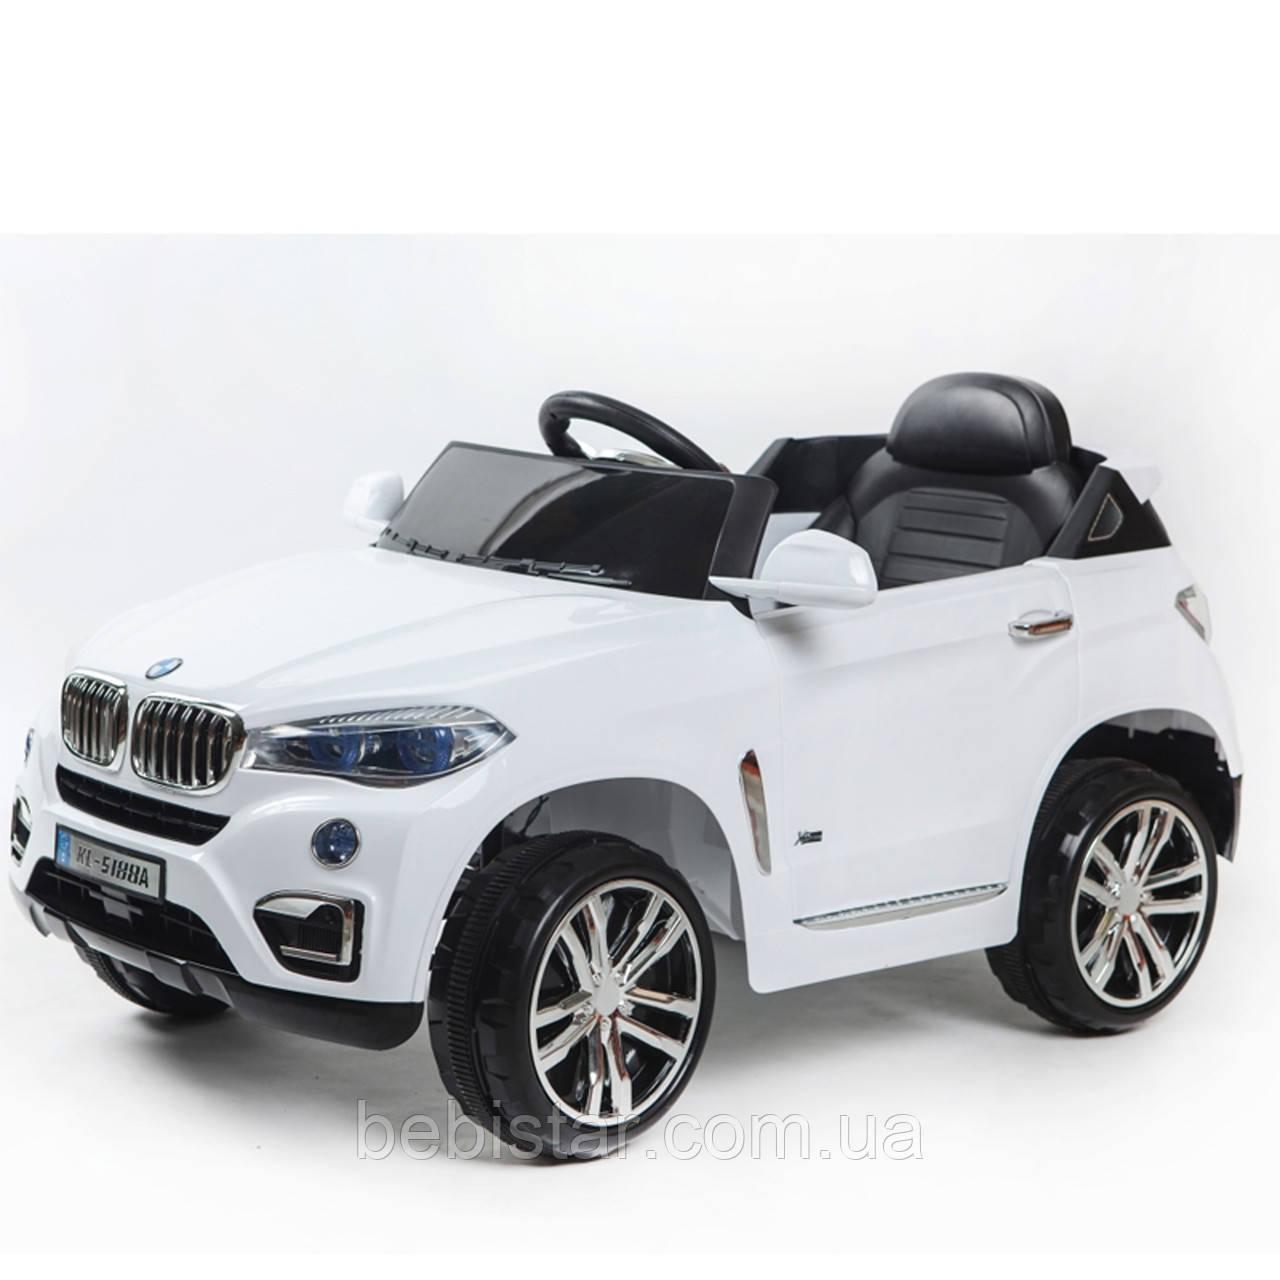 Детский электромобиль белый Джип T-788 EVA WHITE мотор 2*25W аккумулятор 2 х 6V4.5AH деткам 3-8 лет с МР3